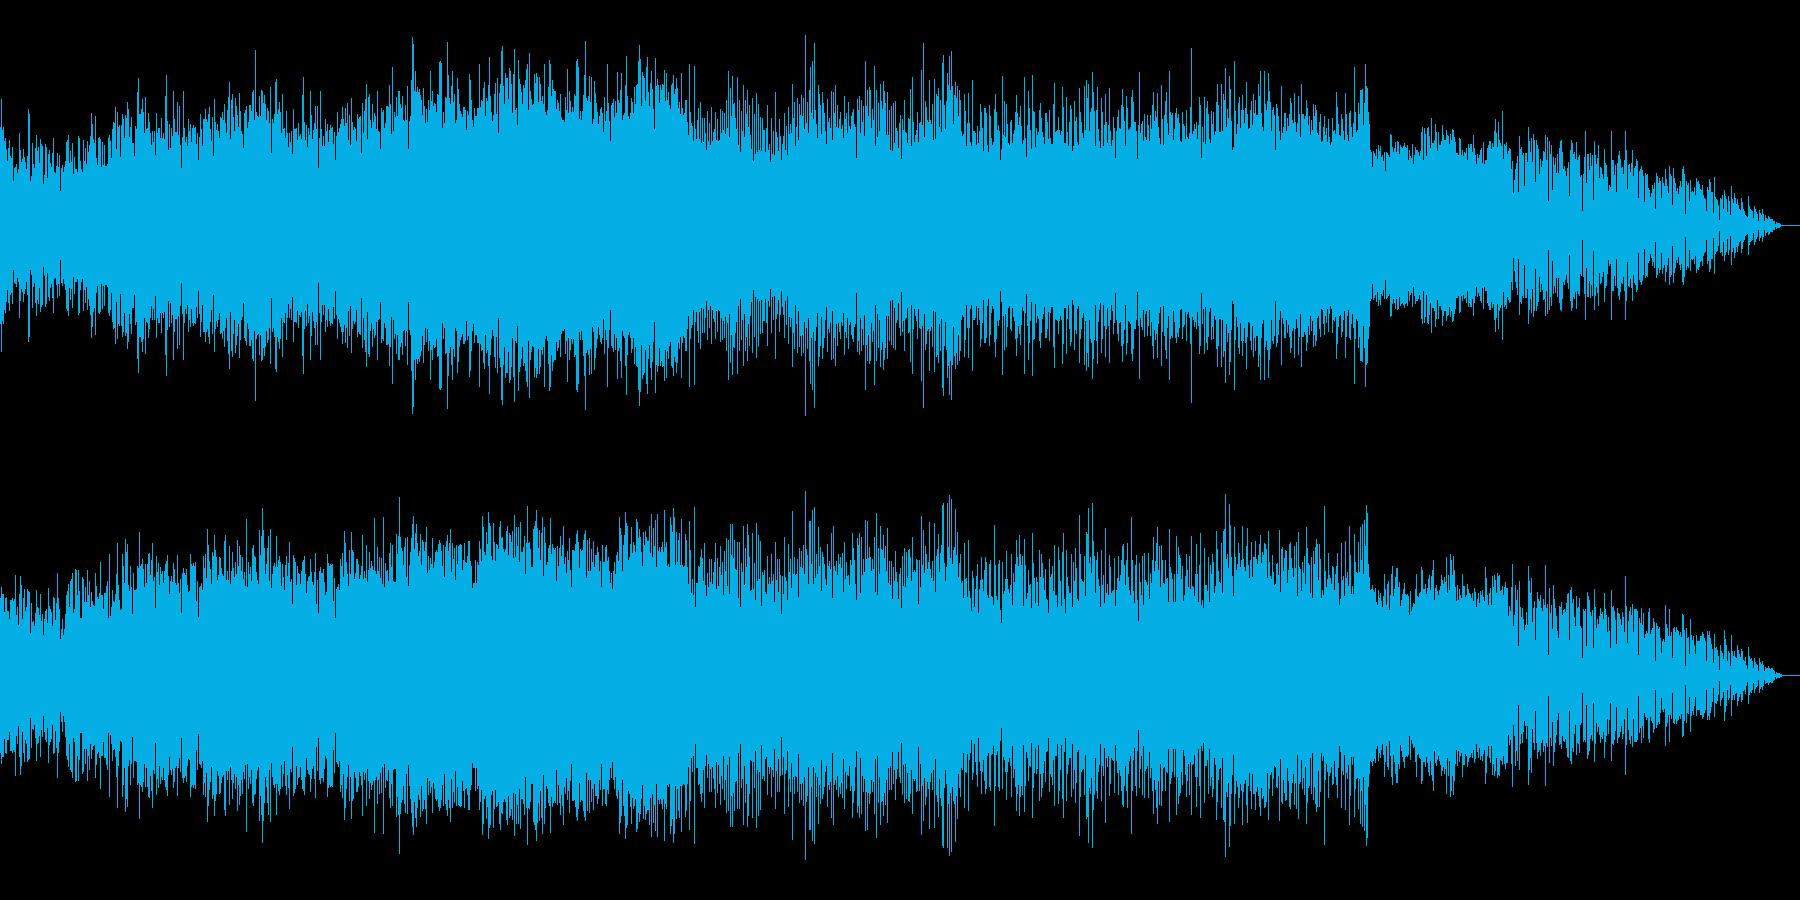 SF感漂うレトロウェーブの再生済みの波形